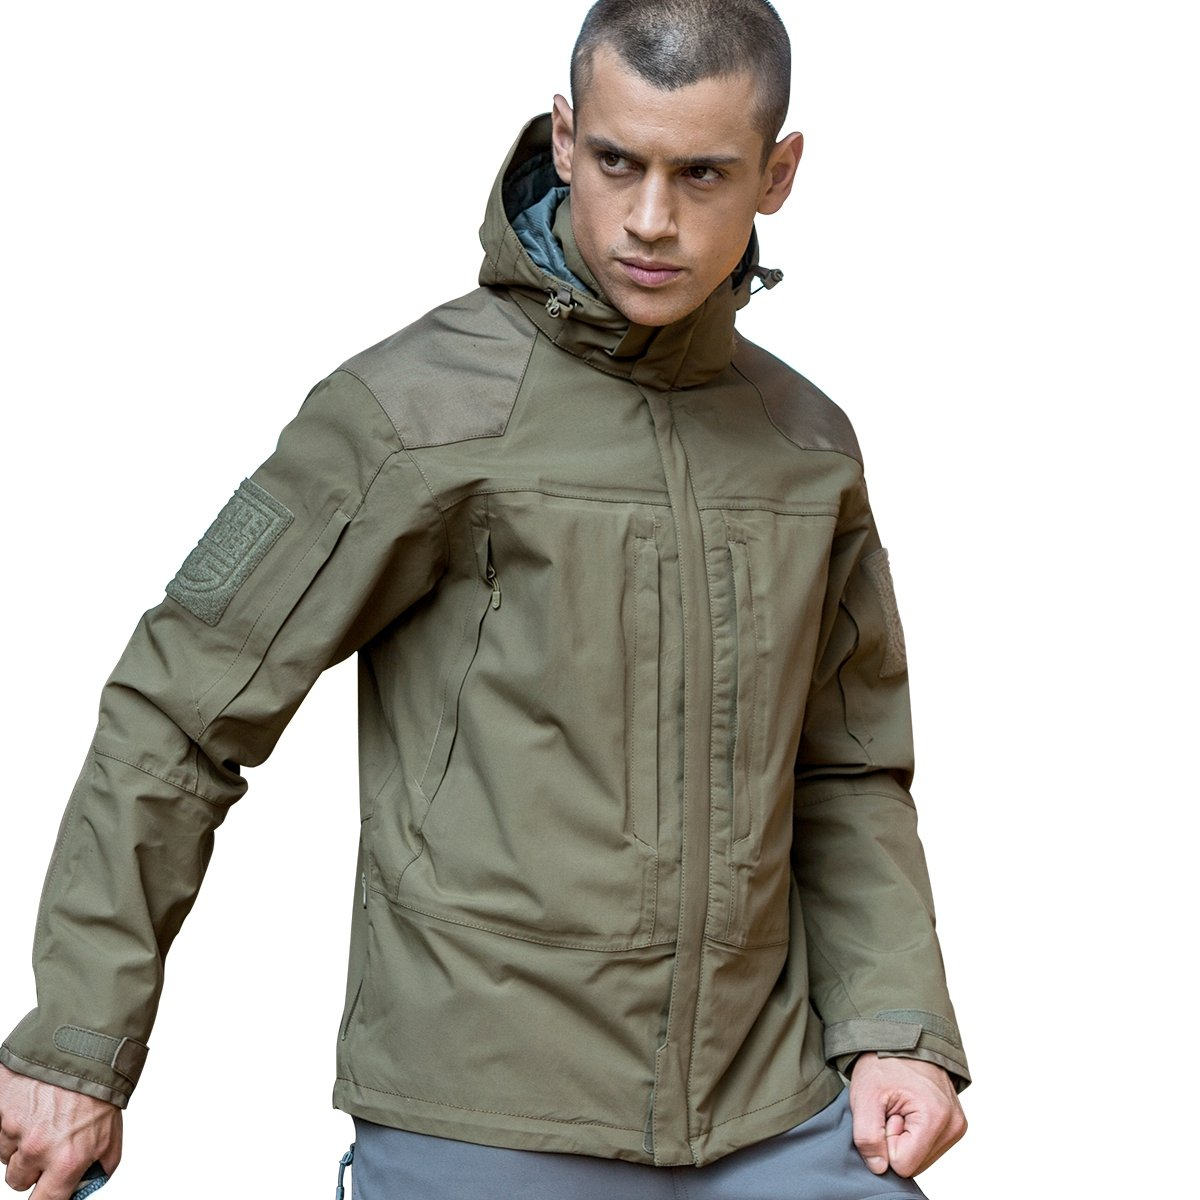 Free Soldierアウトドアメンズジャケット防水性通気性暖かいタクティカルジャケットフリースコート B01M66GKXT Medium|泥 泥 Medium